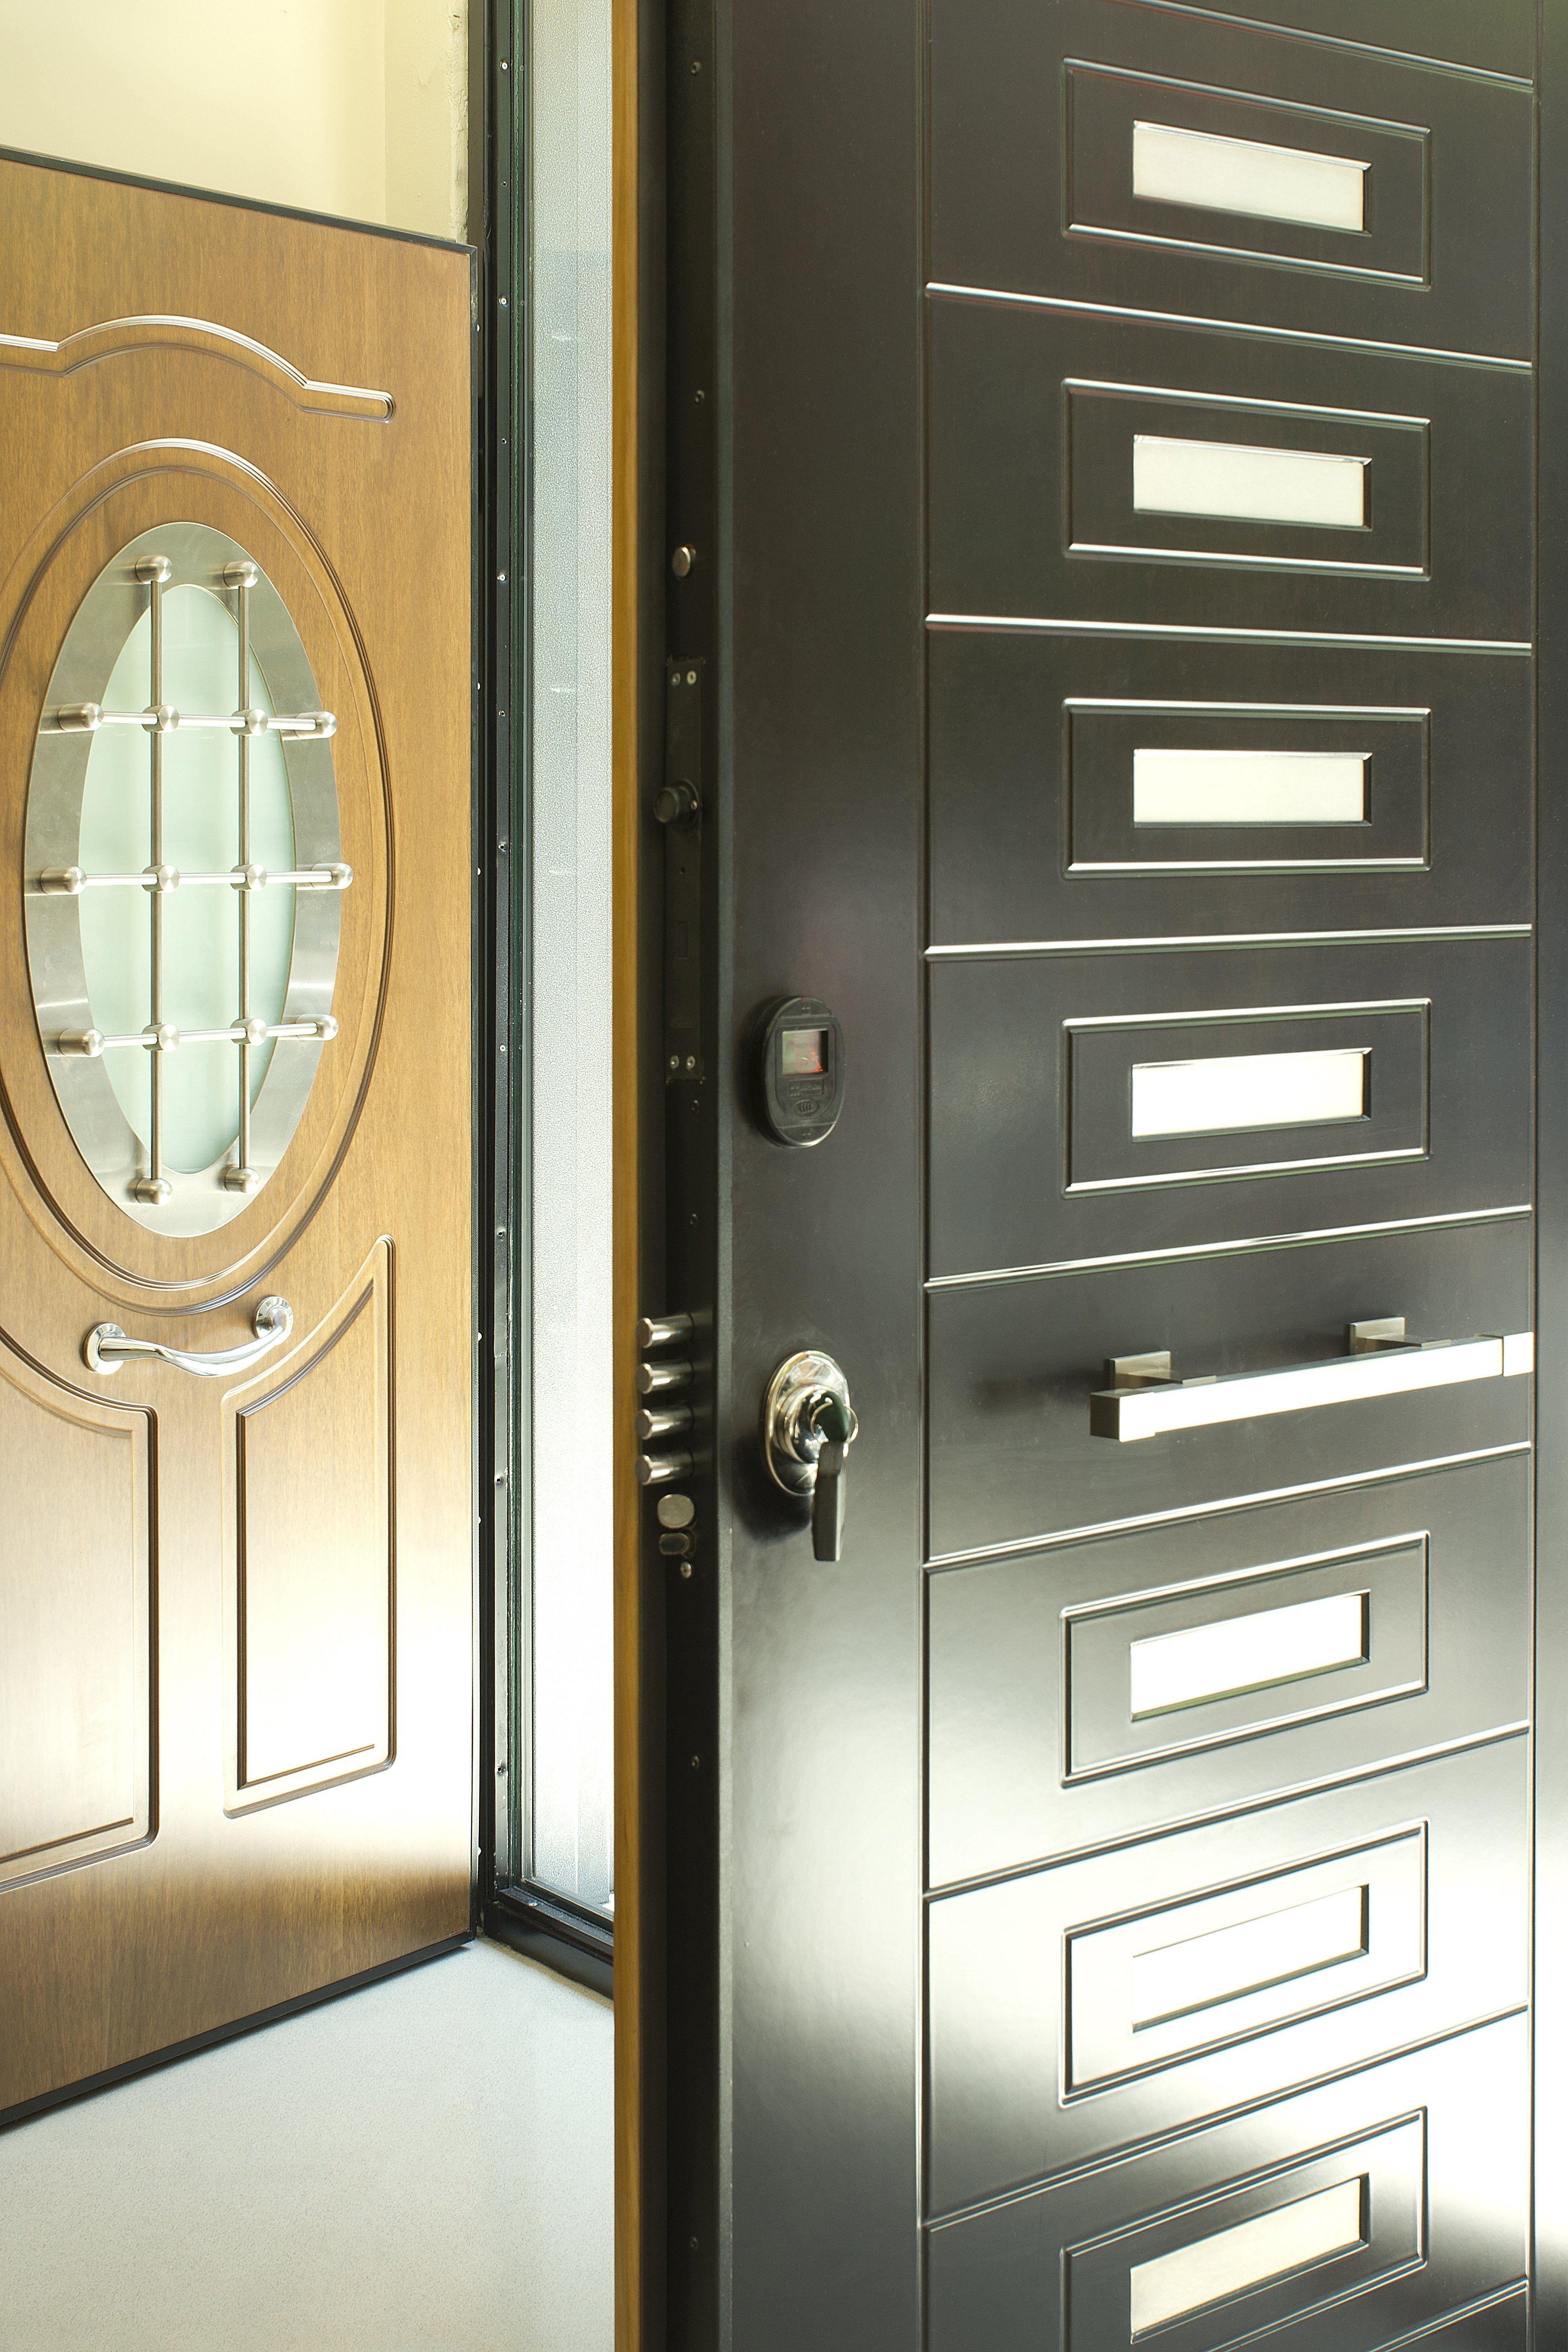 House Front Door Security Httpfranzdondi Pinterest